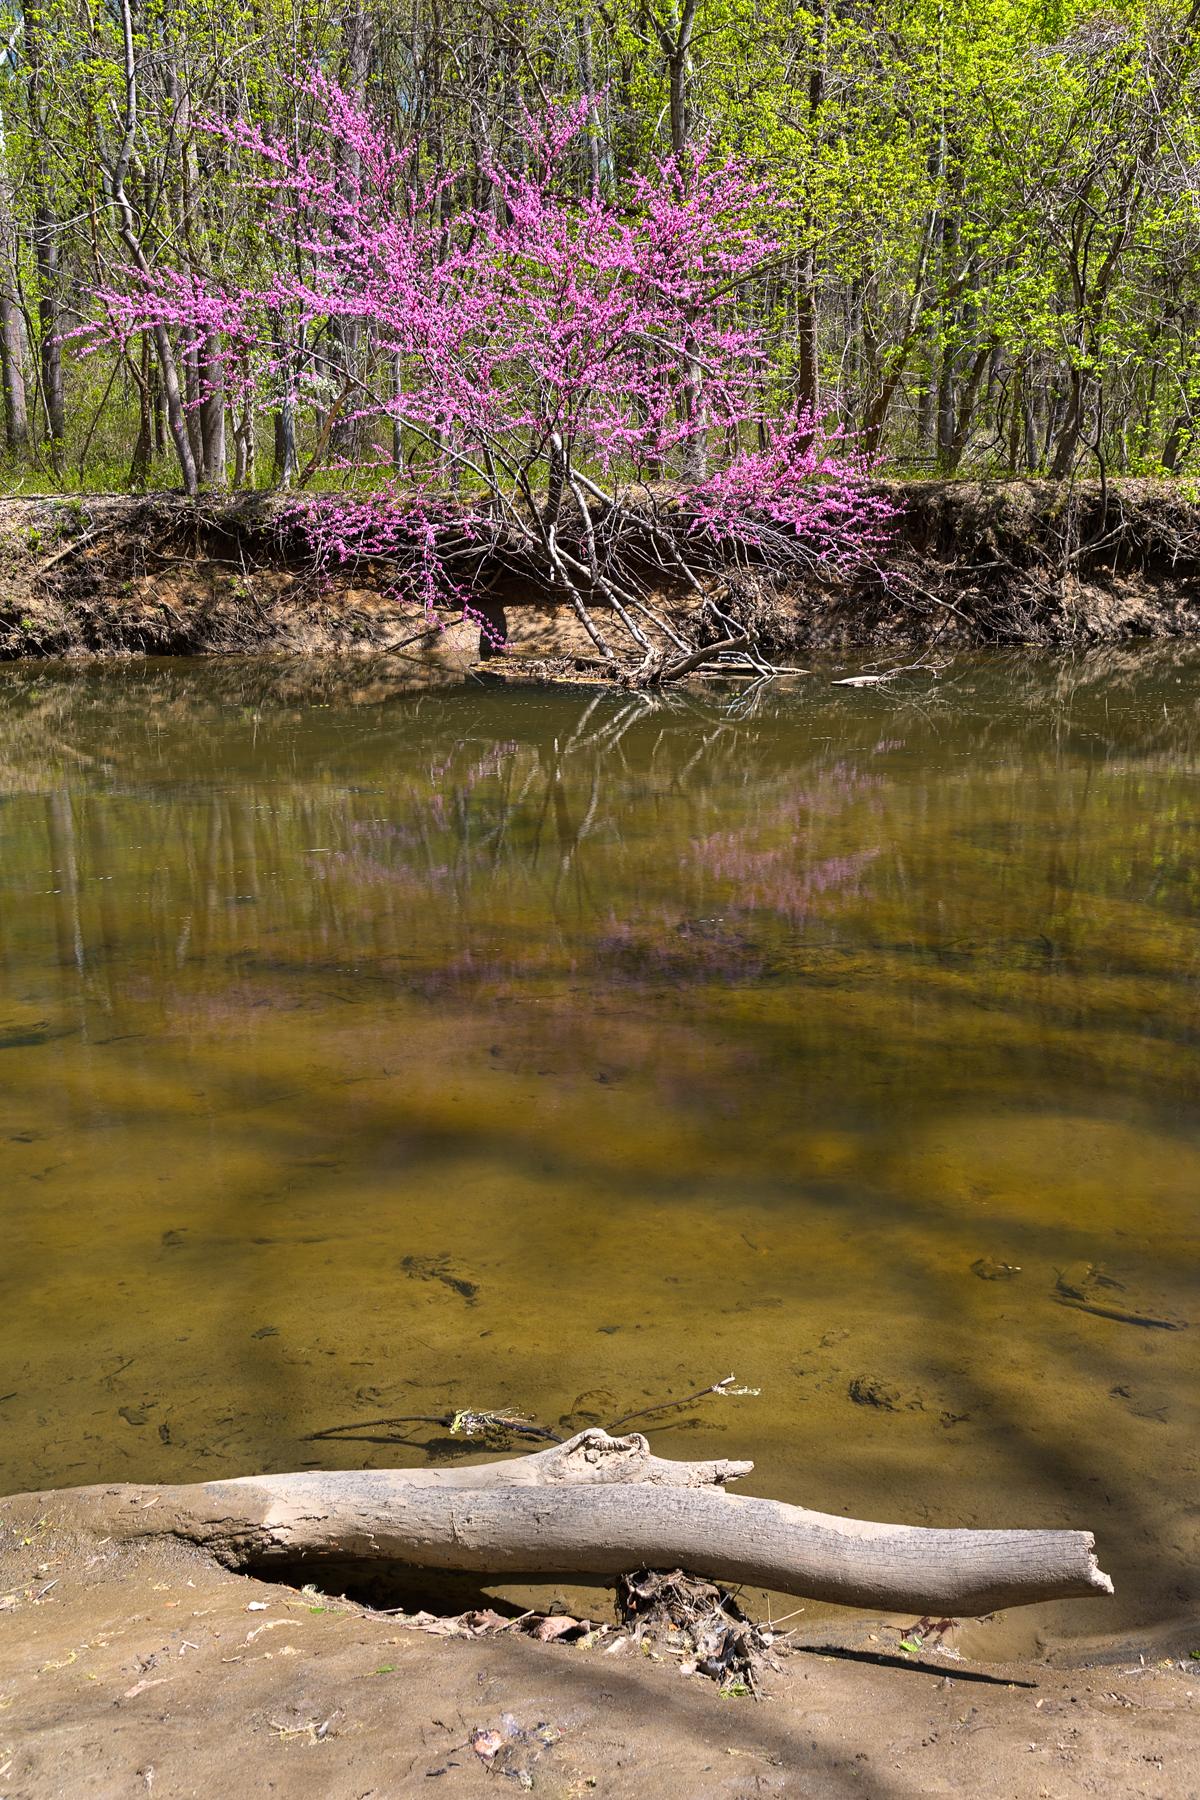 Rock creek stream & foliage - green & pi photo